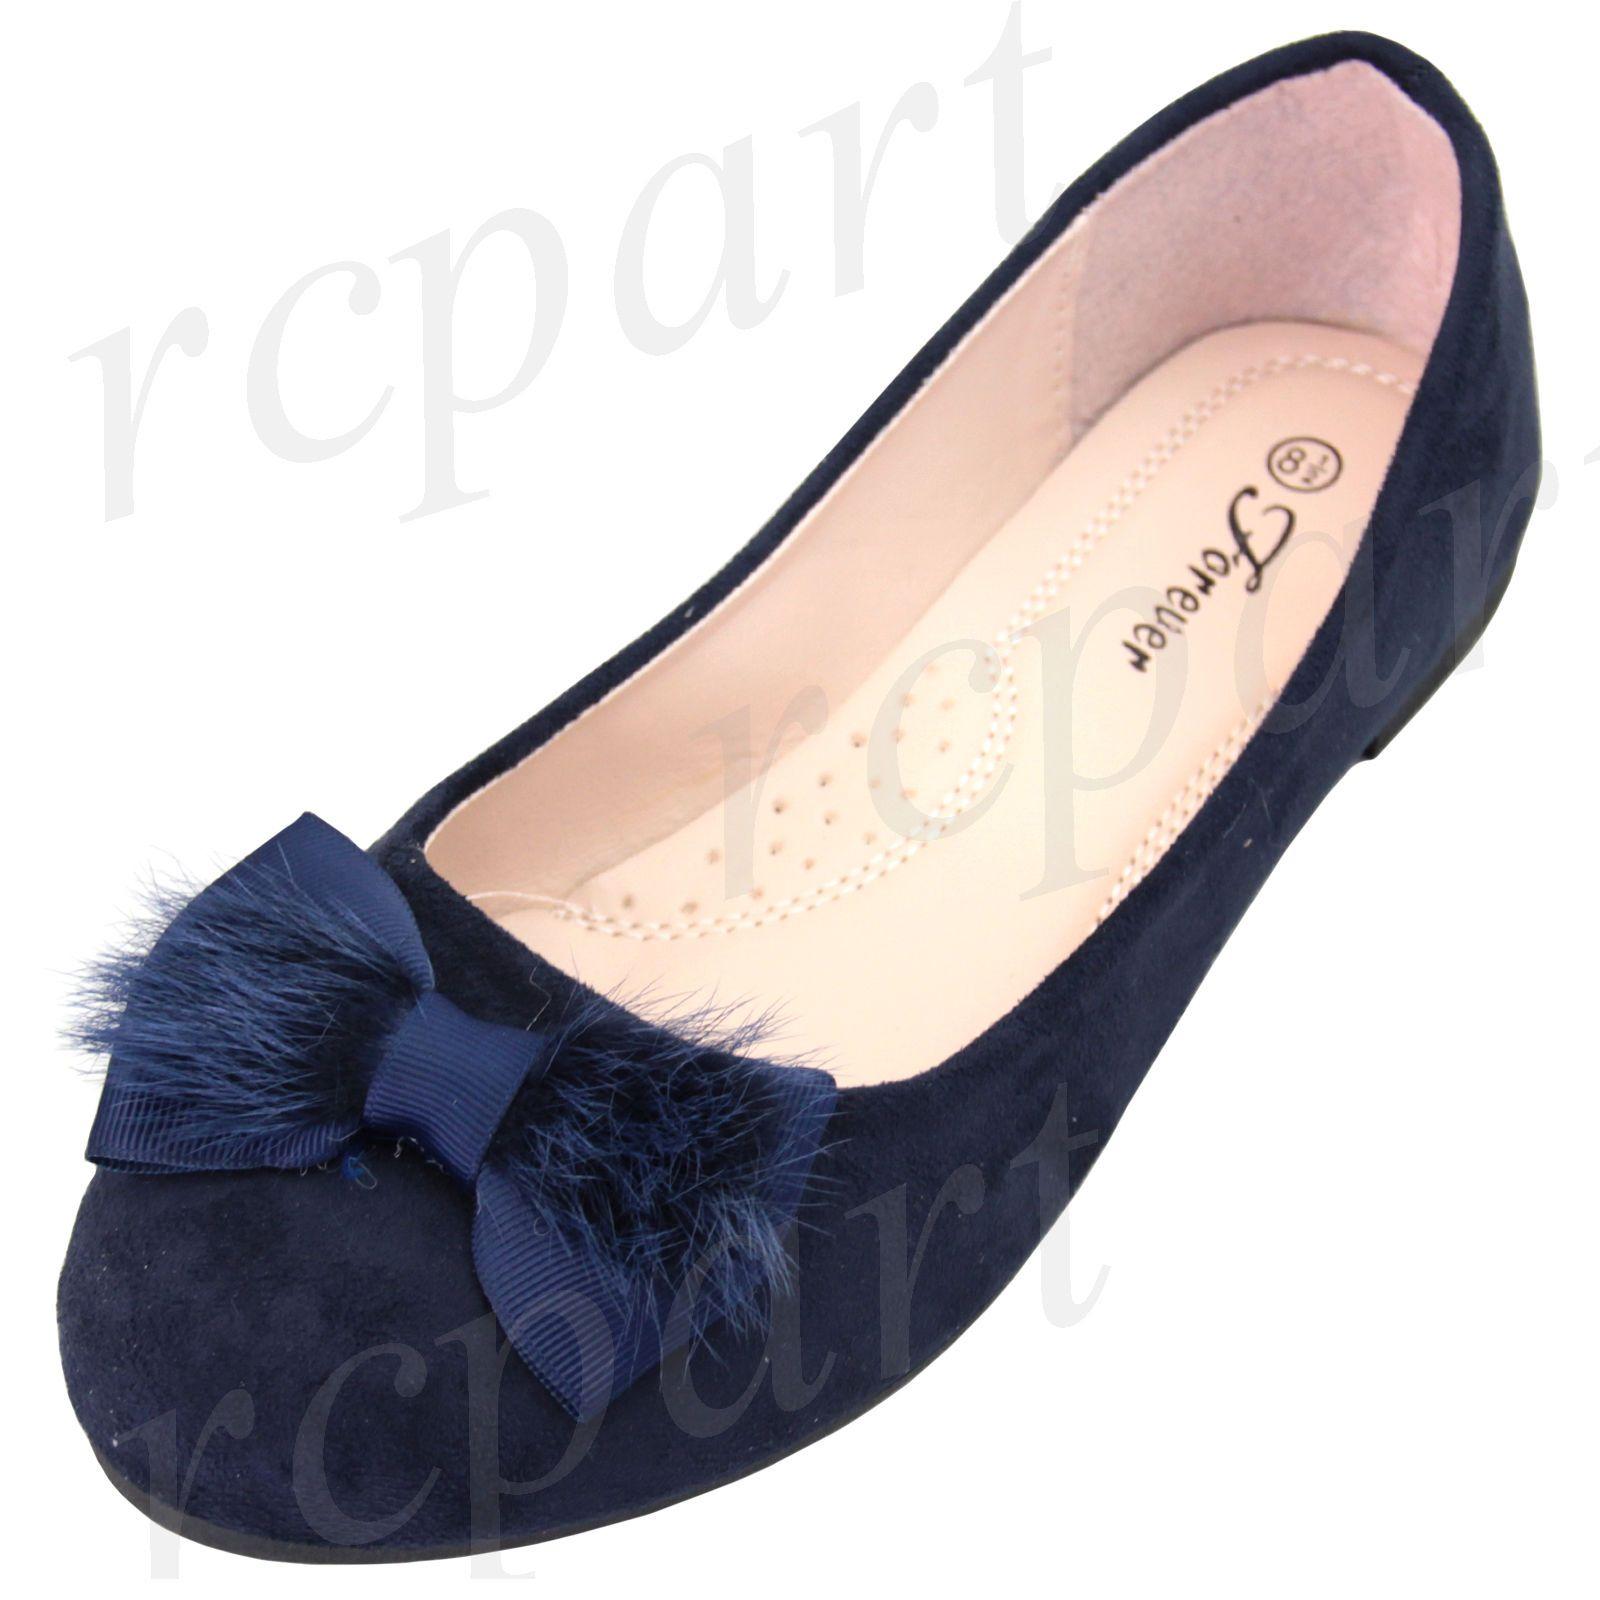 Navy blue dress shoes for wedding  Womenus Shoes Bow Ballerina Ballet Flats Wedding Casual Navy Blue